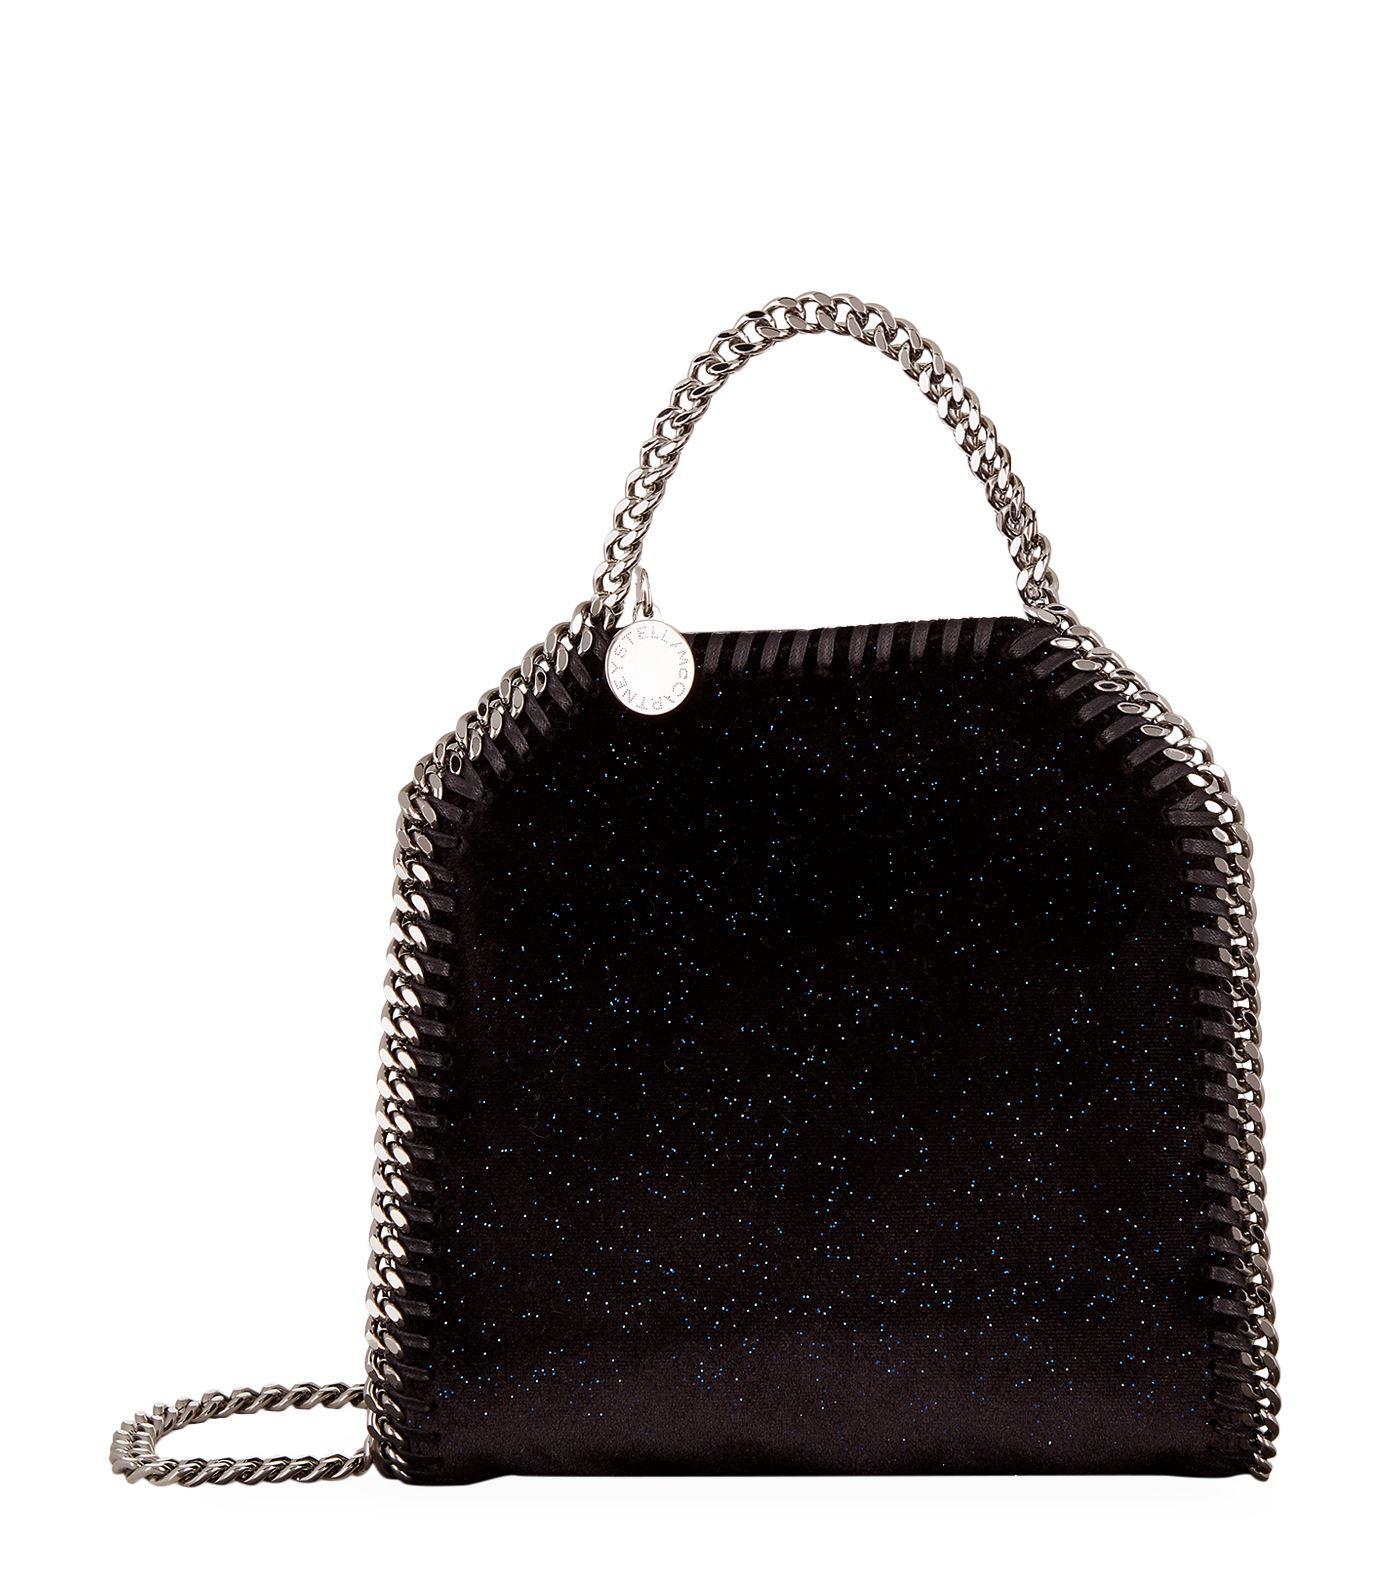 272d473af8fa Stella Mccartney Tiny Falabella Crossbody Bag